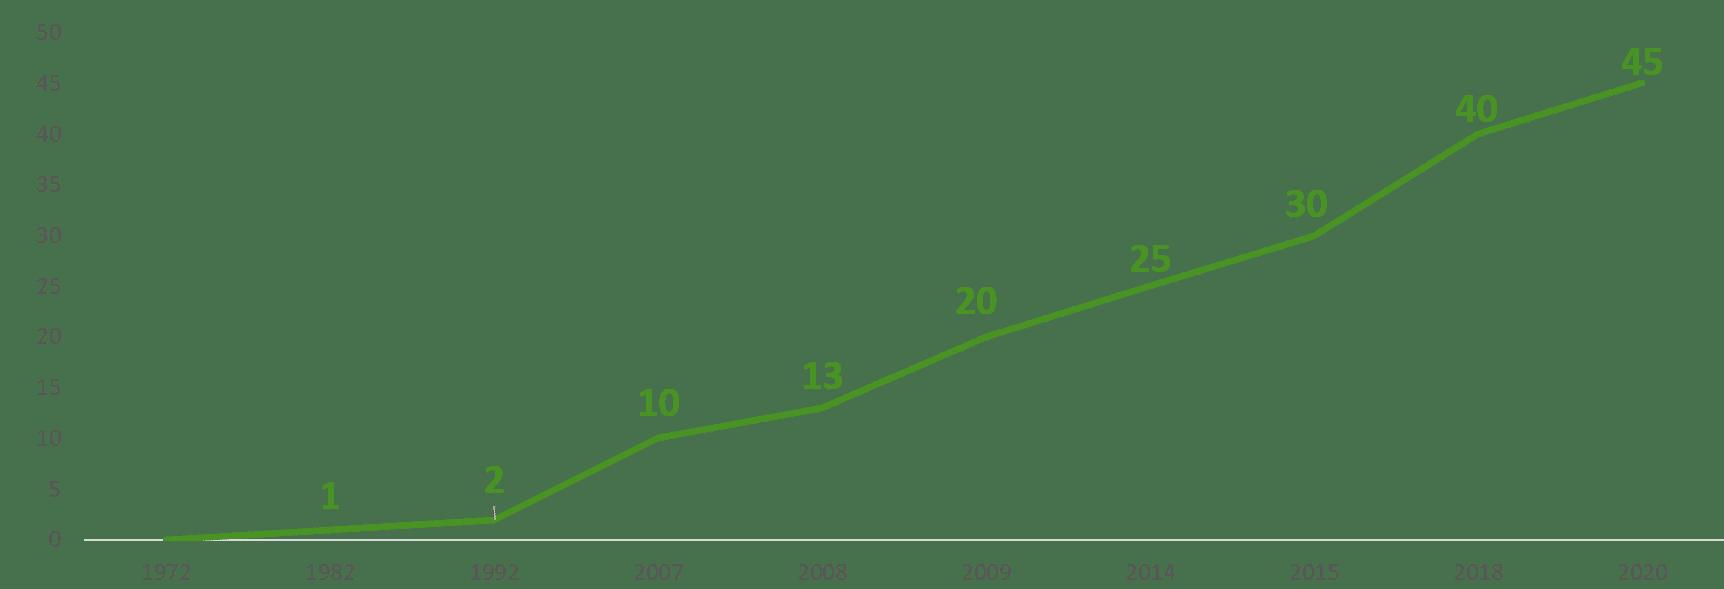 Lumiplan_EvolutionCA_2020